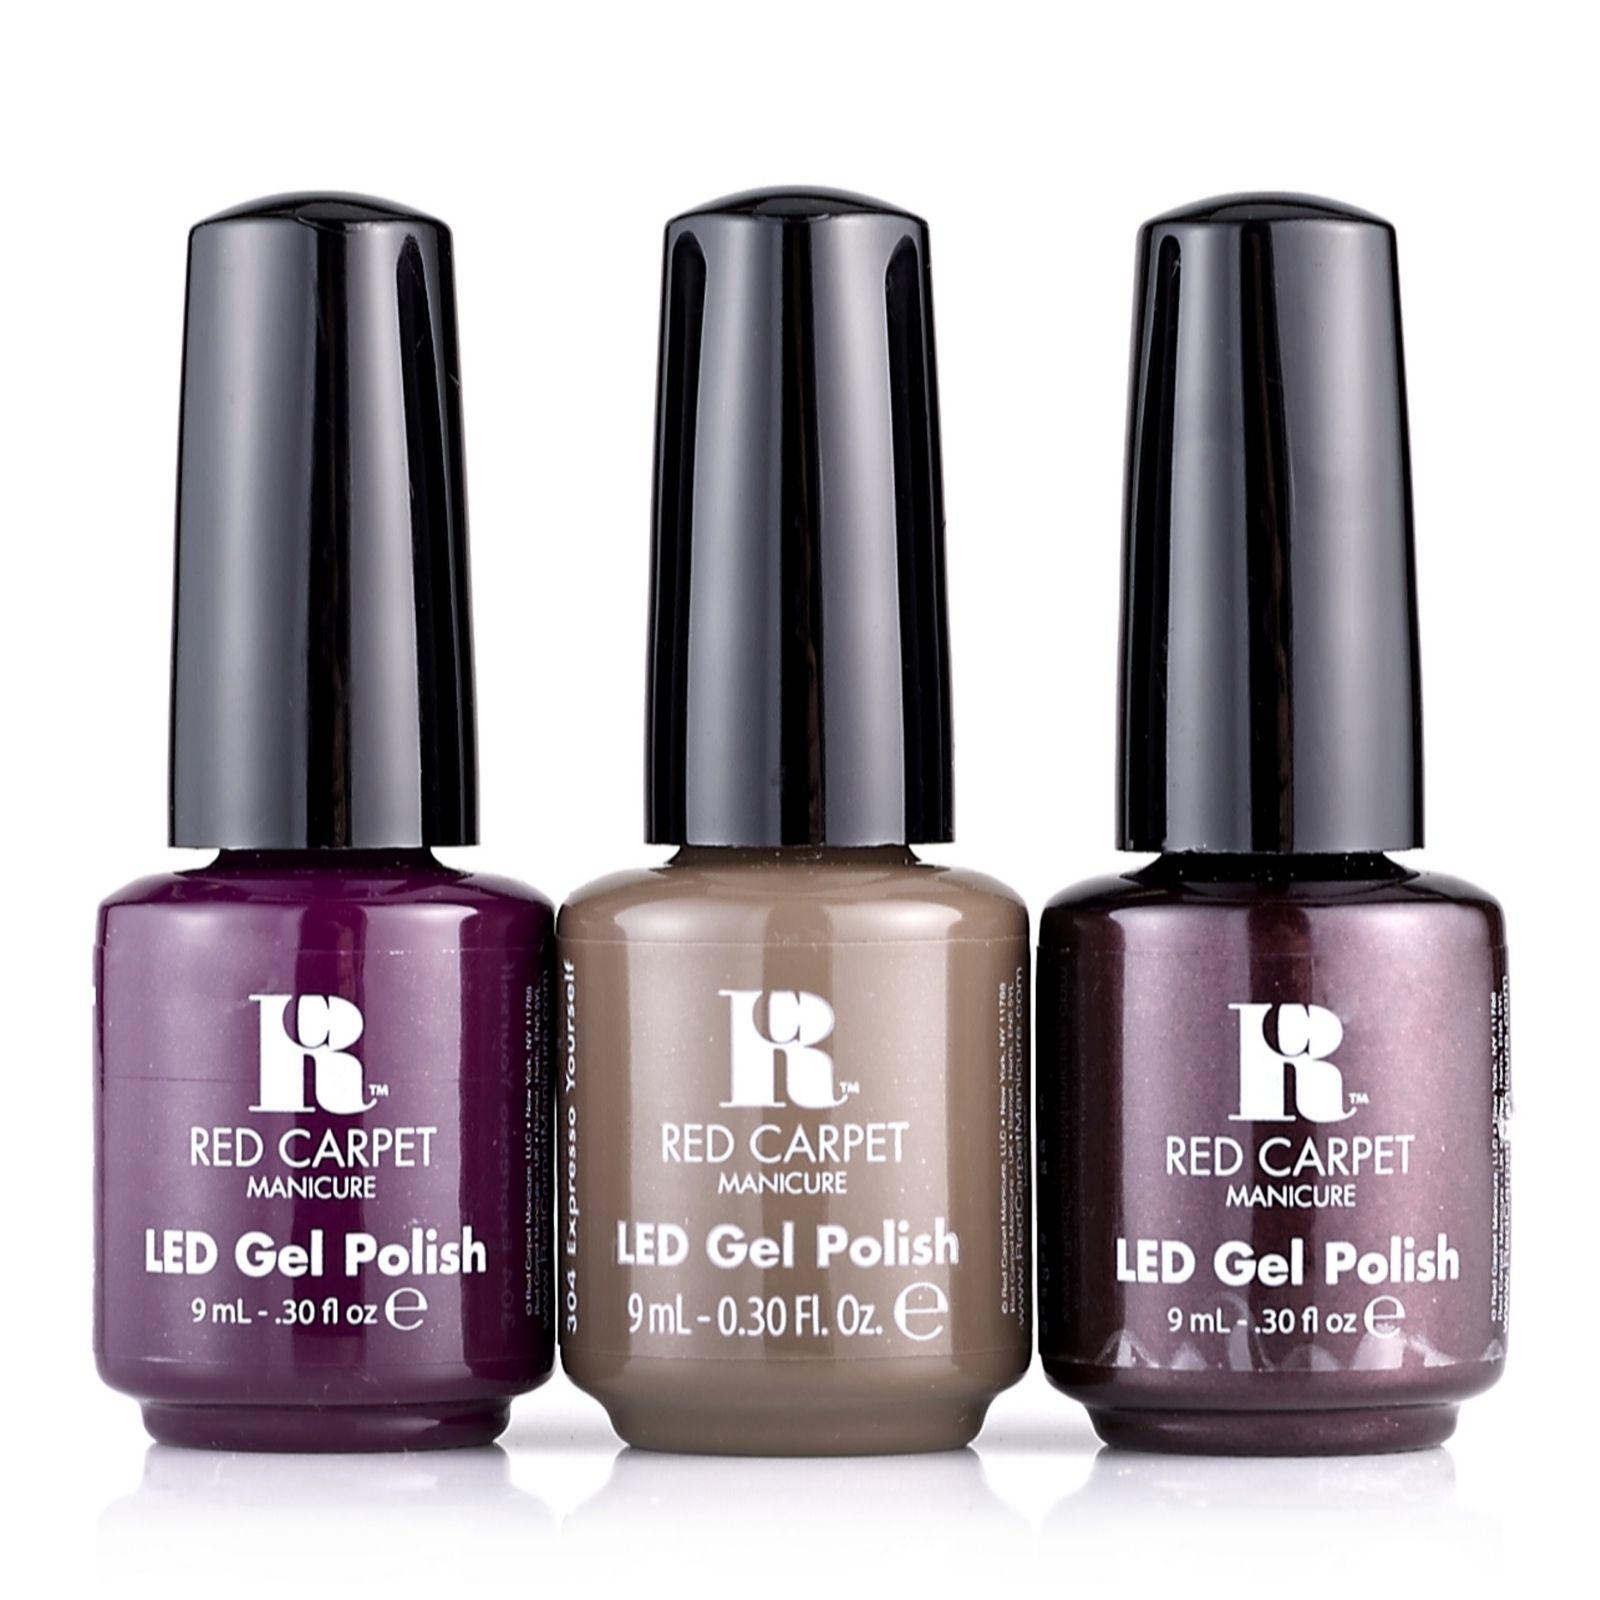 Uv gel nail polish kit qvc – Great photo blog about manicure 2017